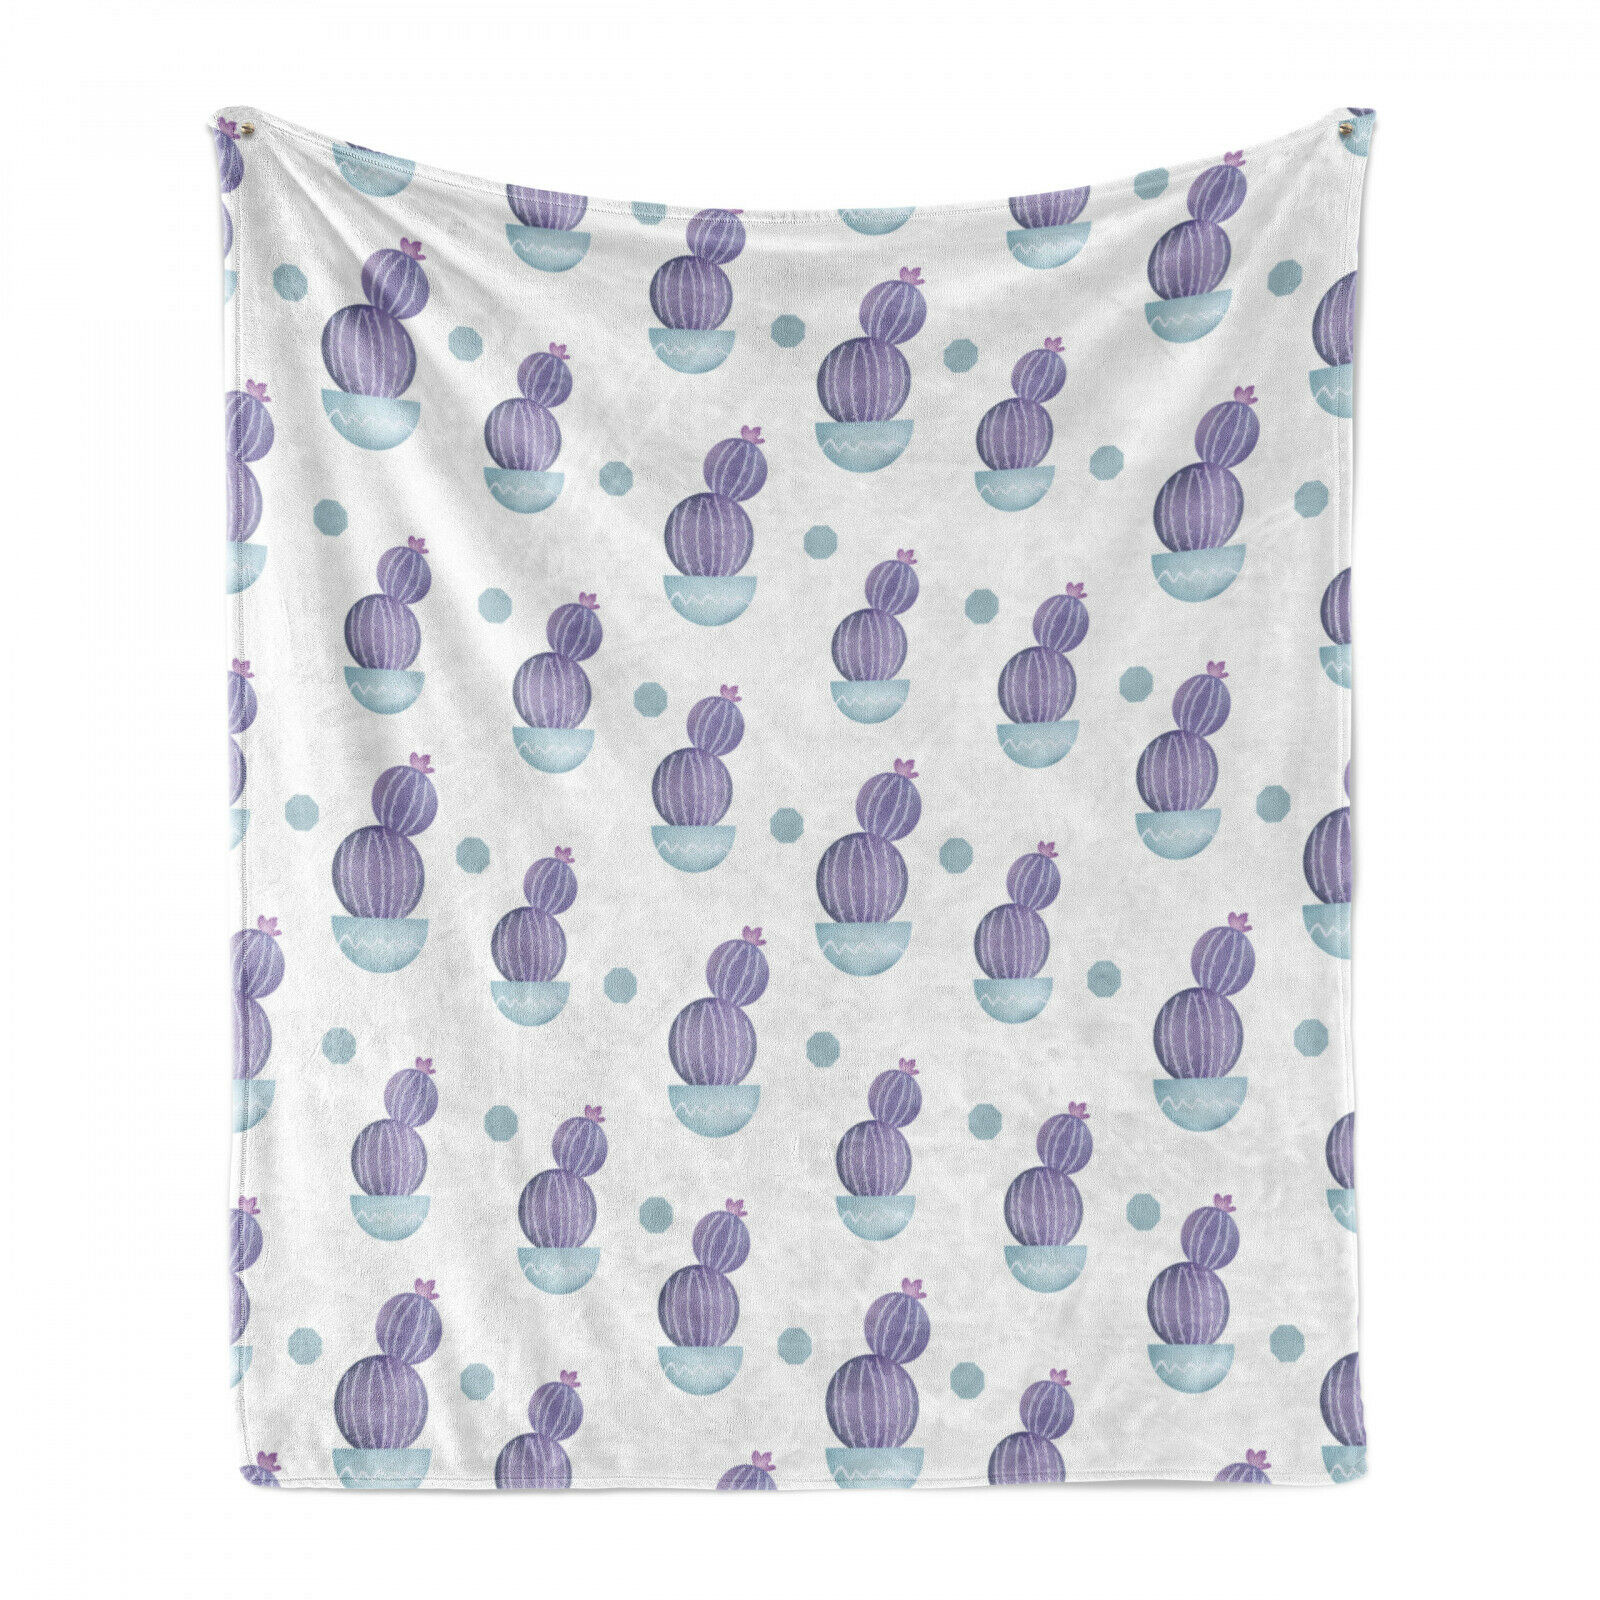 Lush Soft Flannel Fleece Blanket Pastel Cactus Plant Art